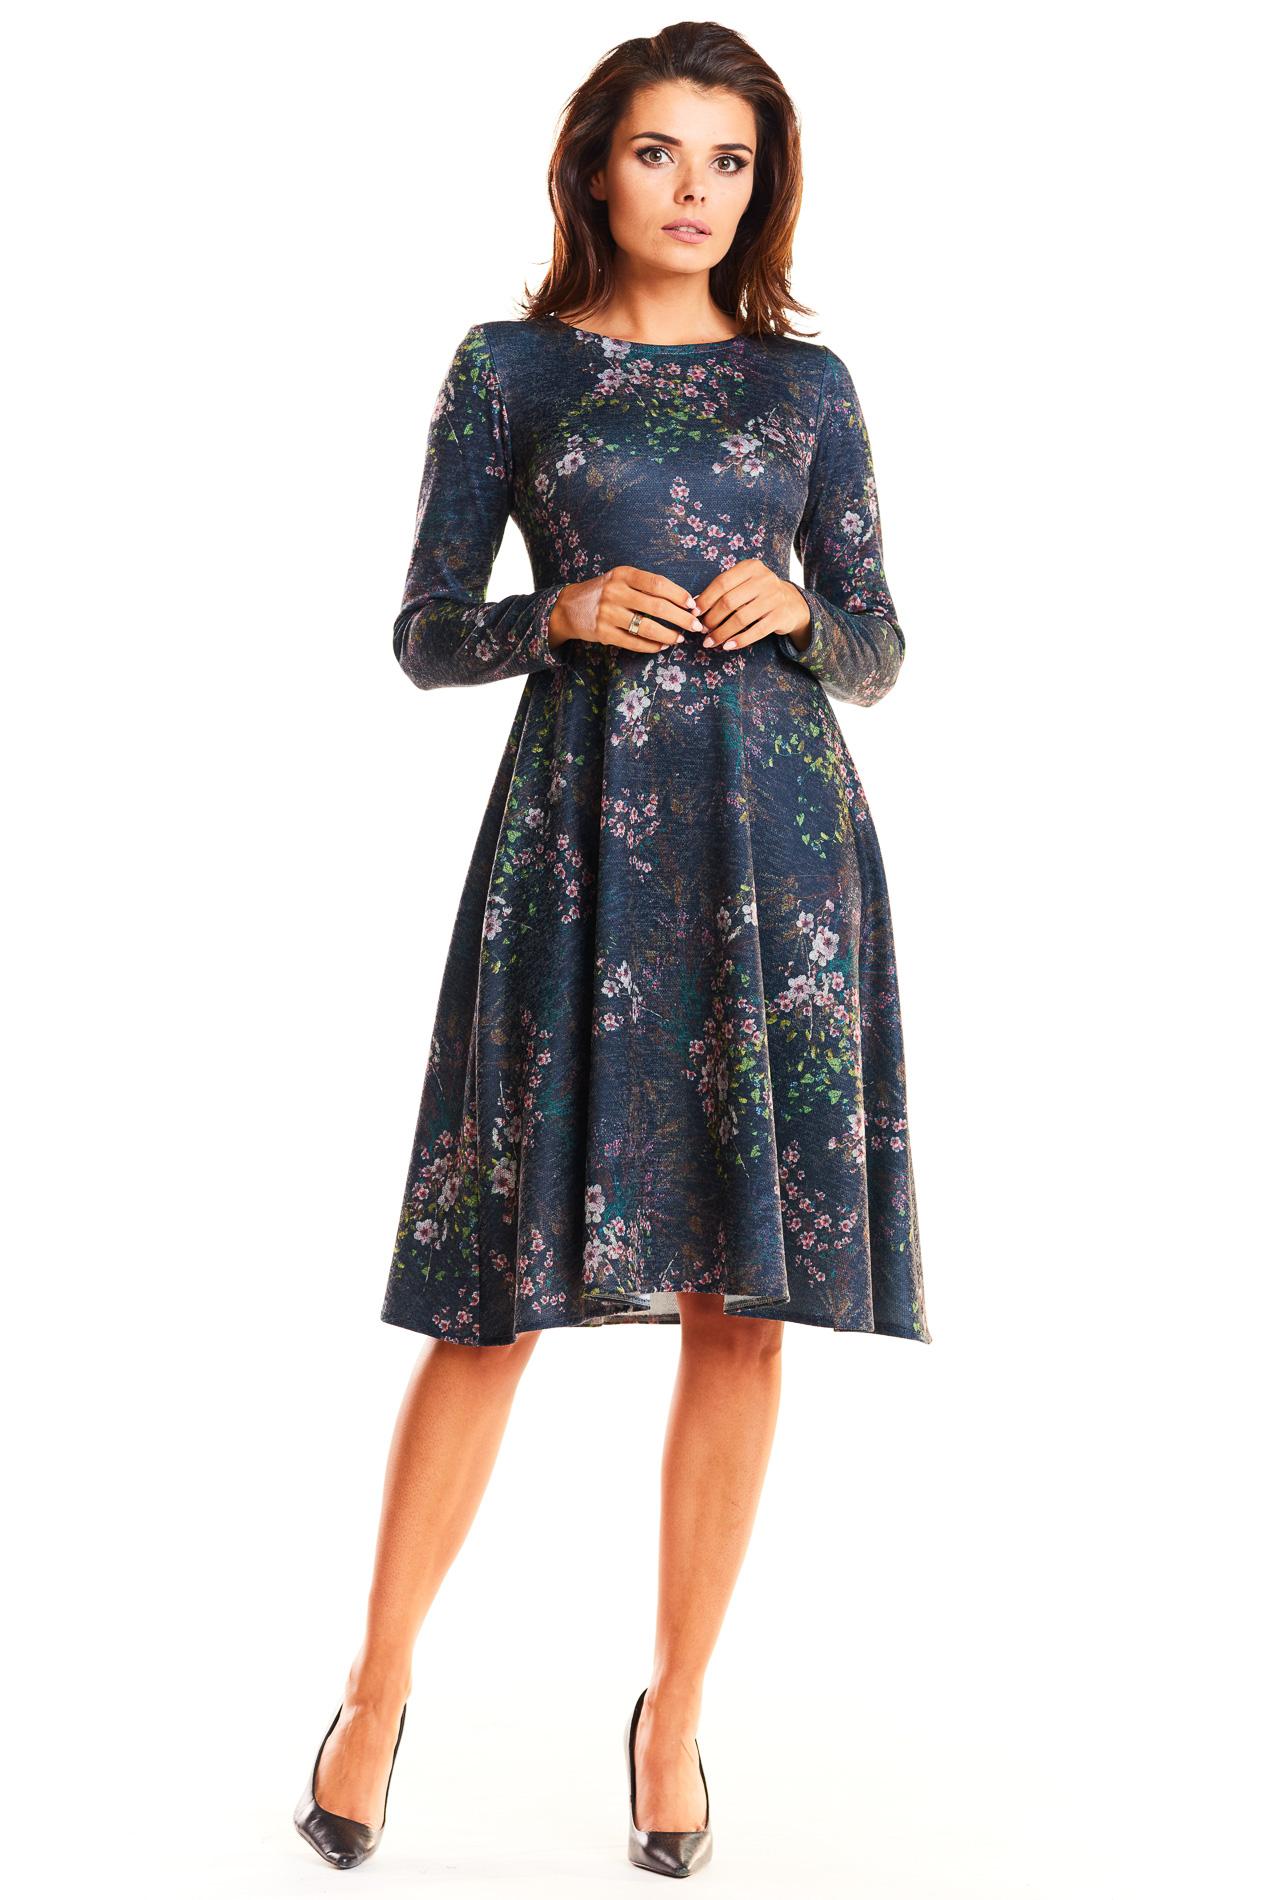 8b921dd2c4 Elegancka dzianinowa sukienka odcinana w talii granatowa